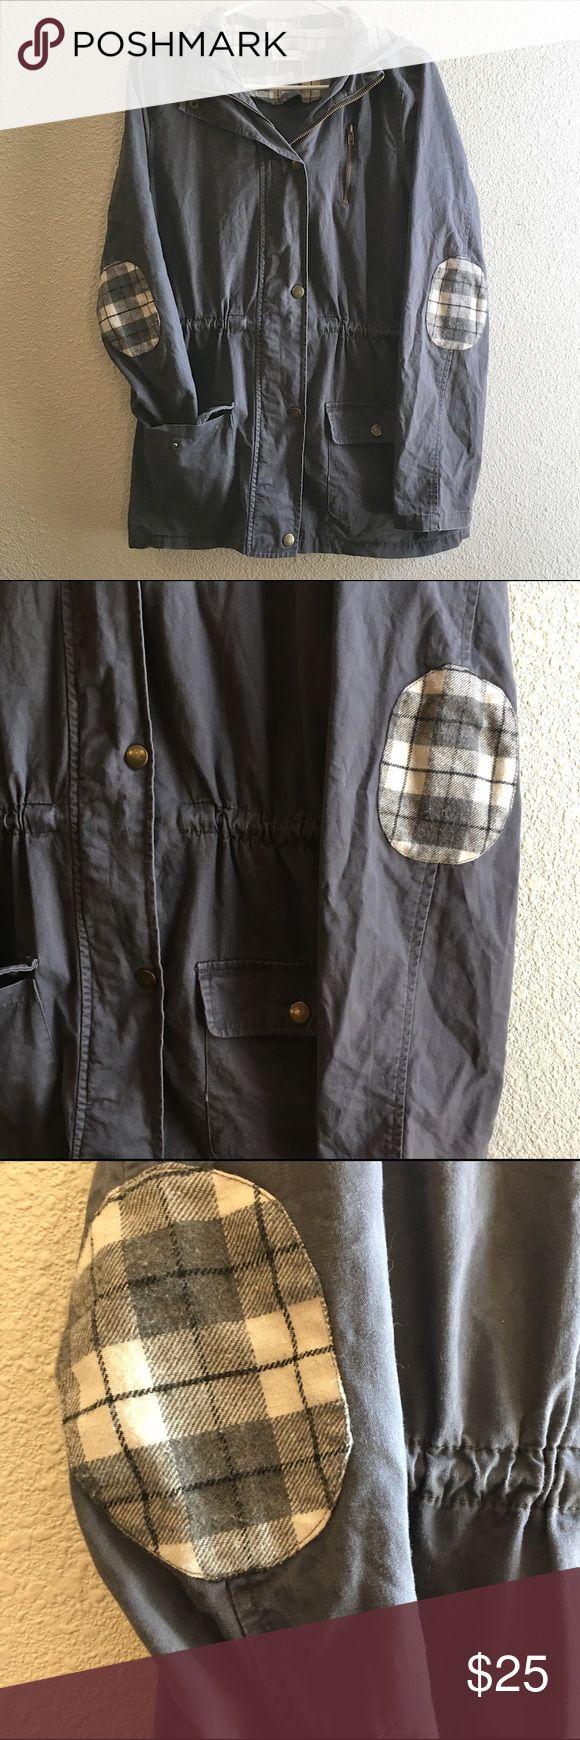 Leather jacket repair ottawa - Blu Pepper Plaid Elbow Patch Utility Jacket Blue